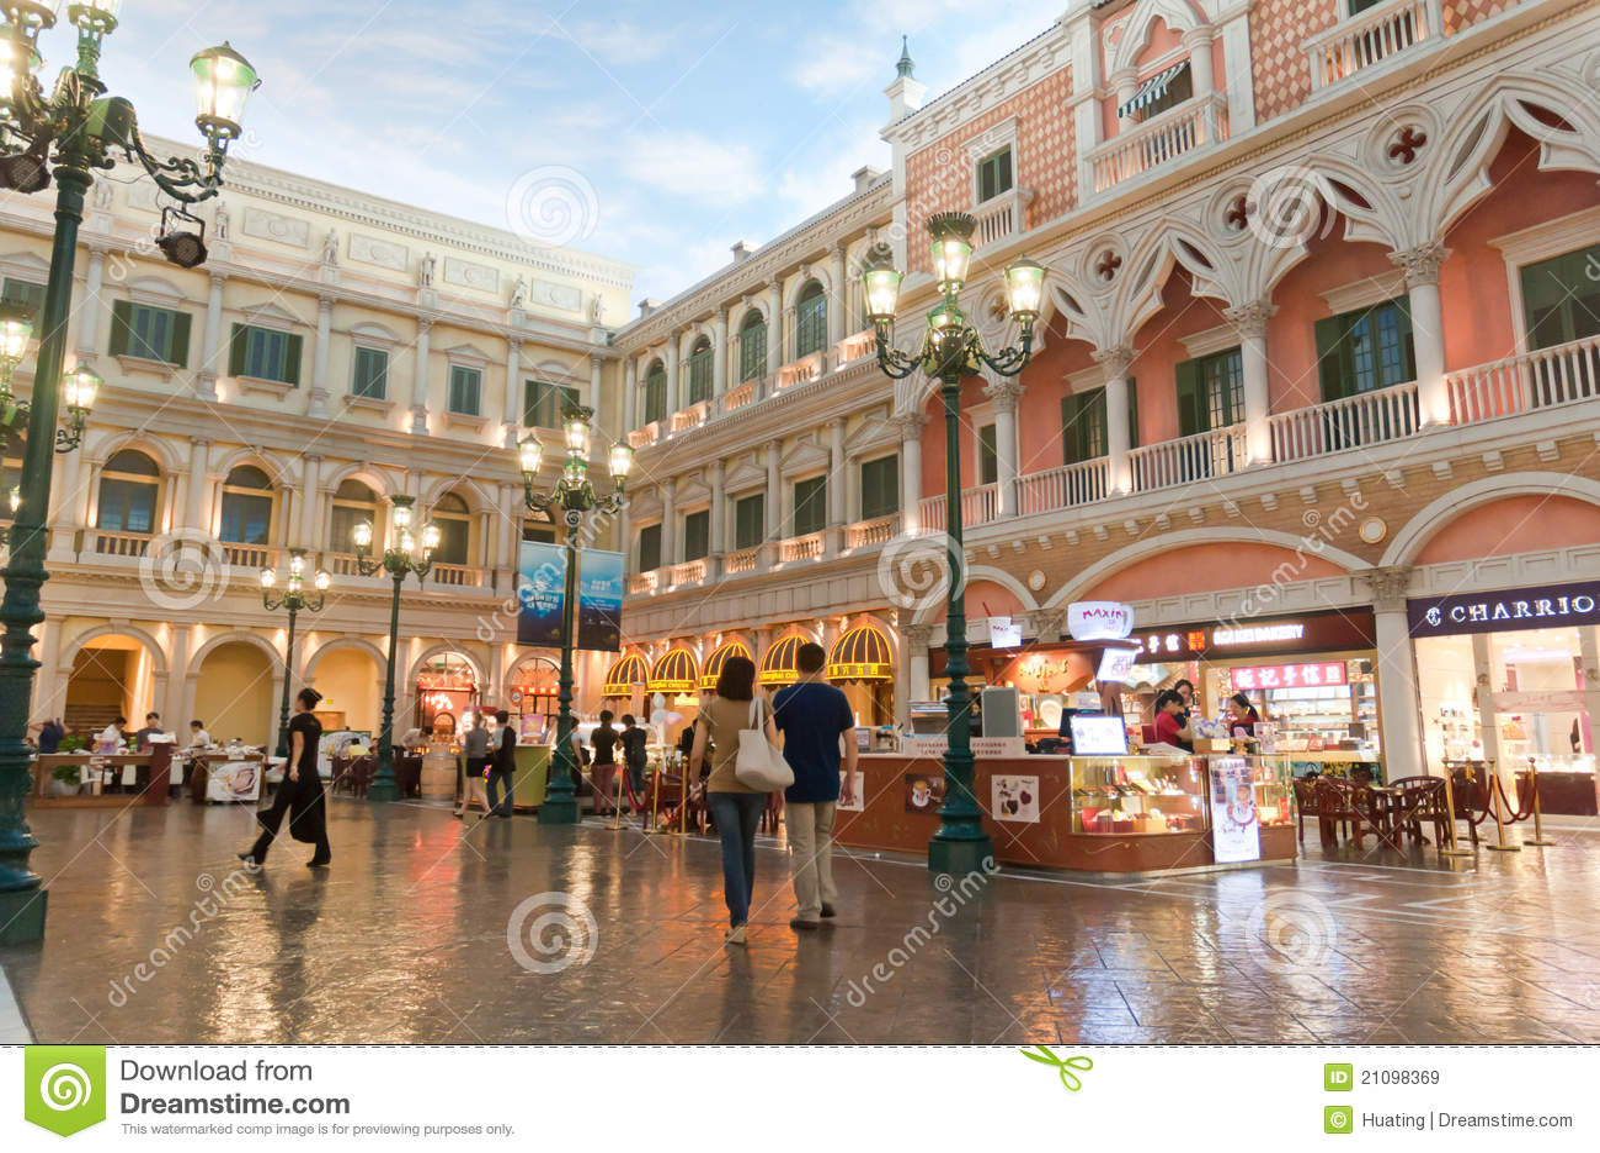 Macau Hotel  The Parisian Macao  Luxury Landmark Hotel